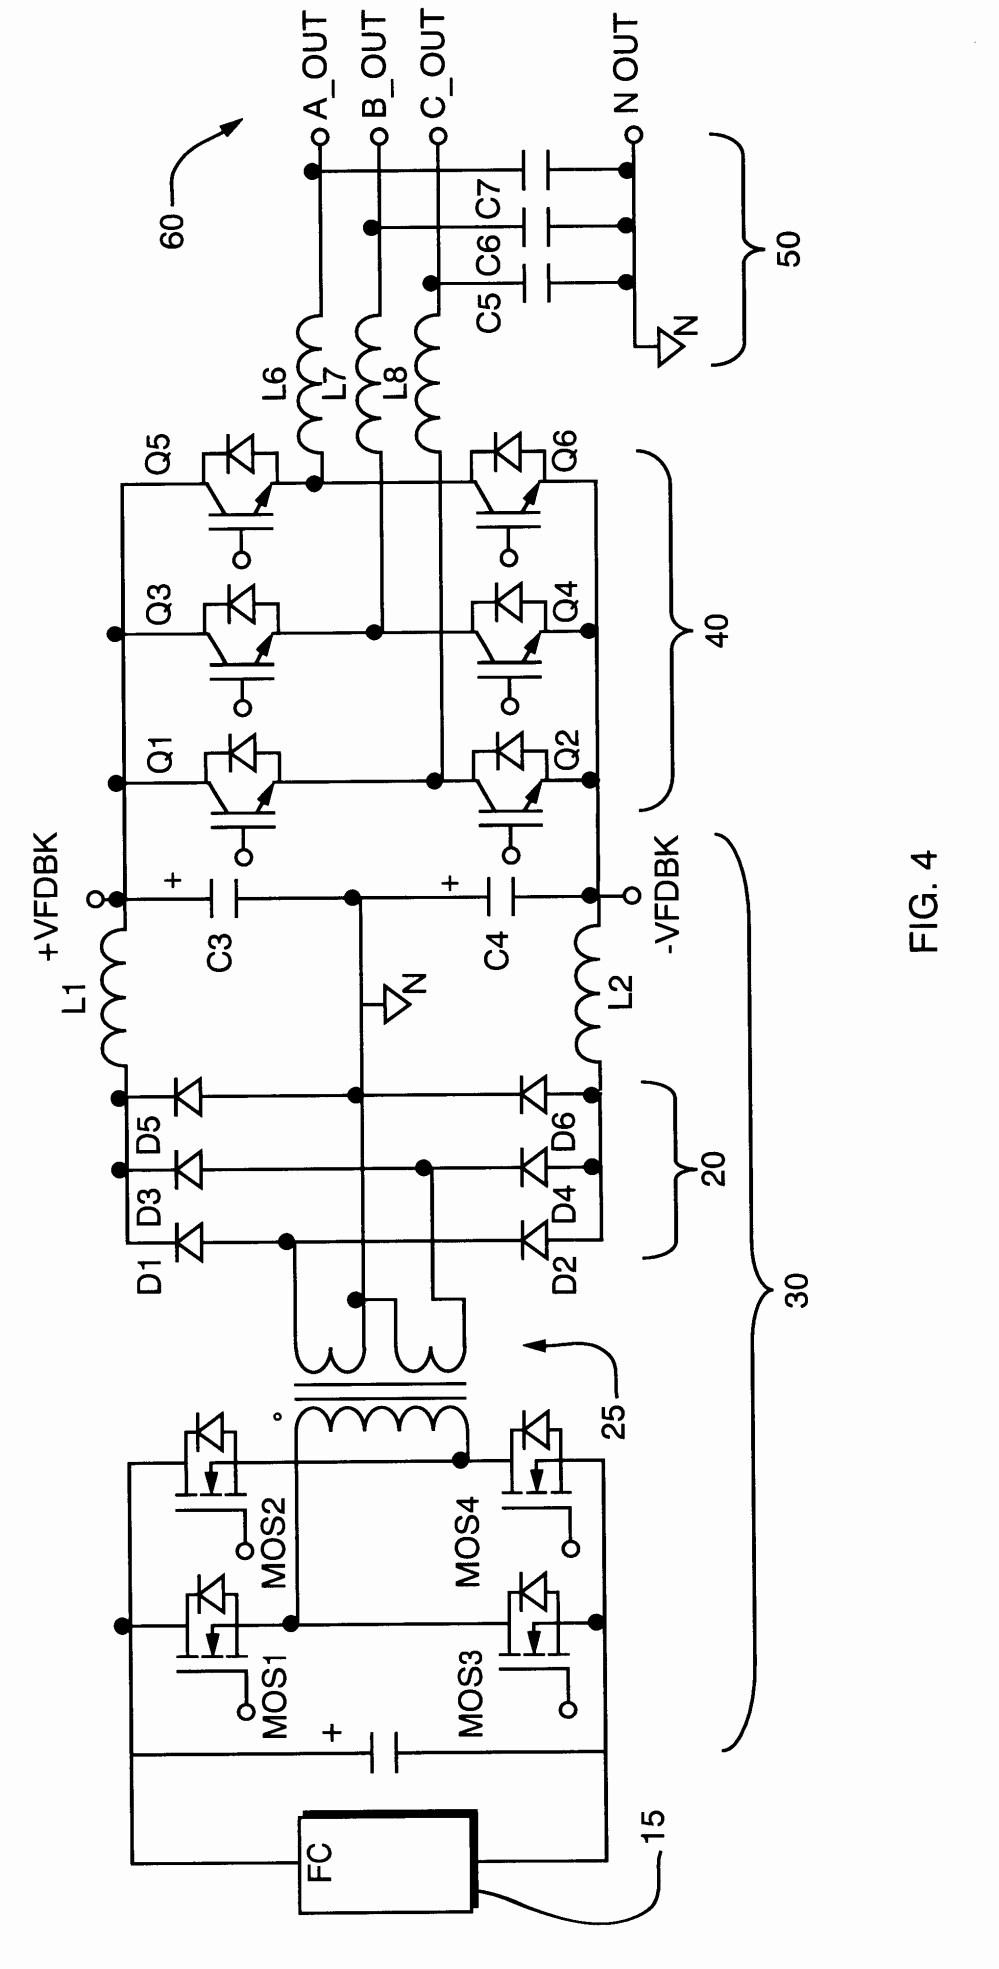 medium resolution of abb ach550 wiring diagram sample wiring diagram sampleabb ach550 wiring diagram download full size of wiring